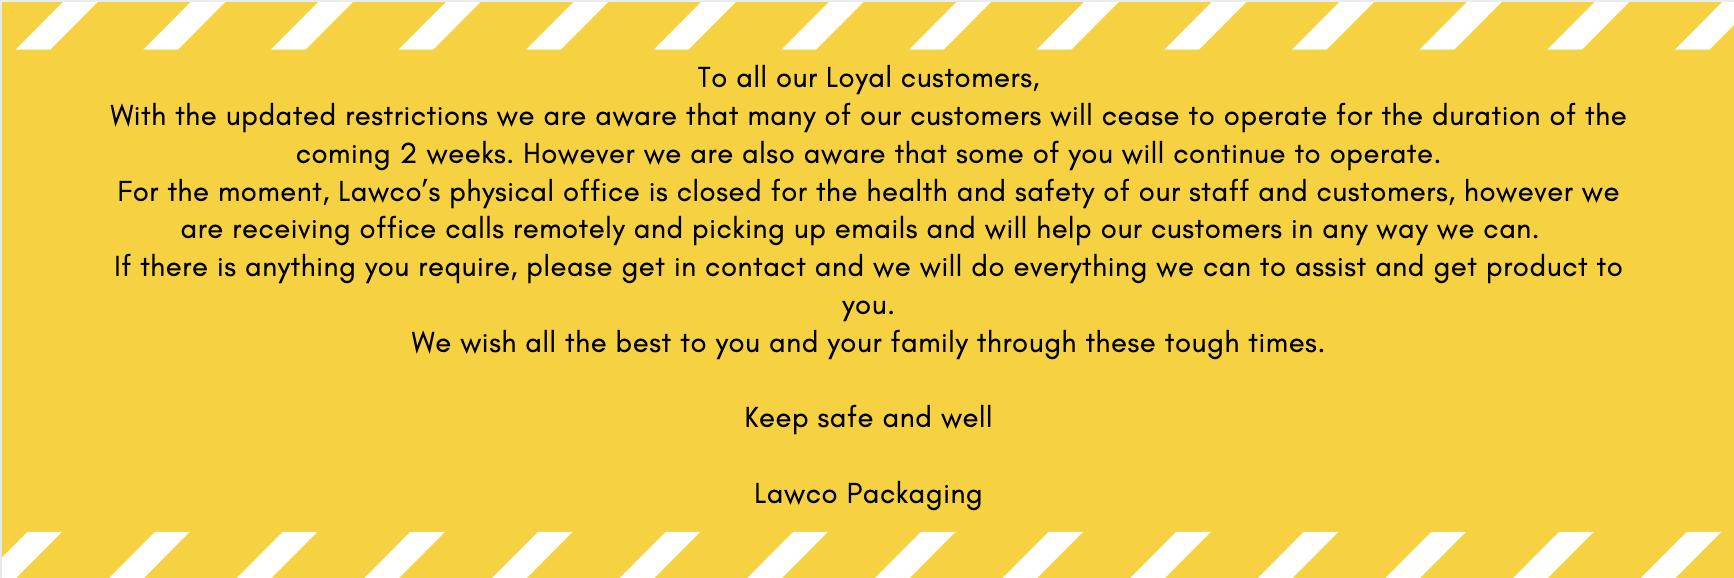 Lawco Business News